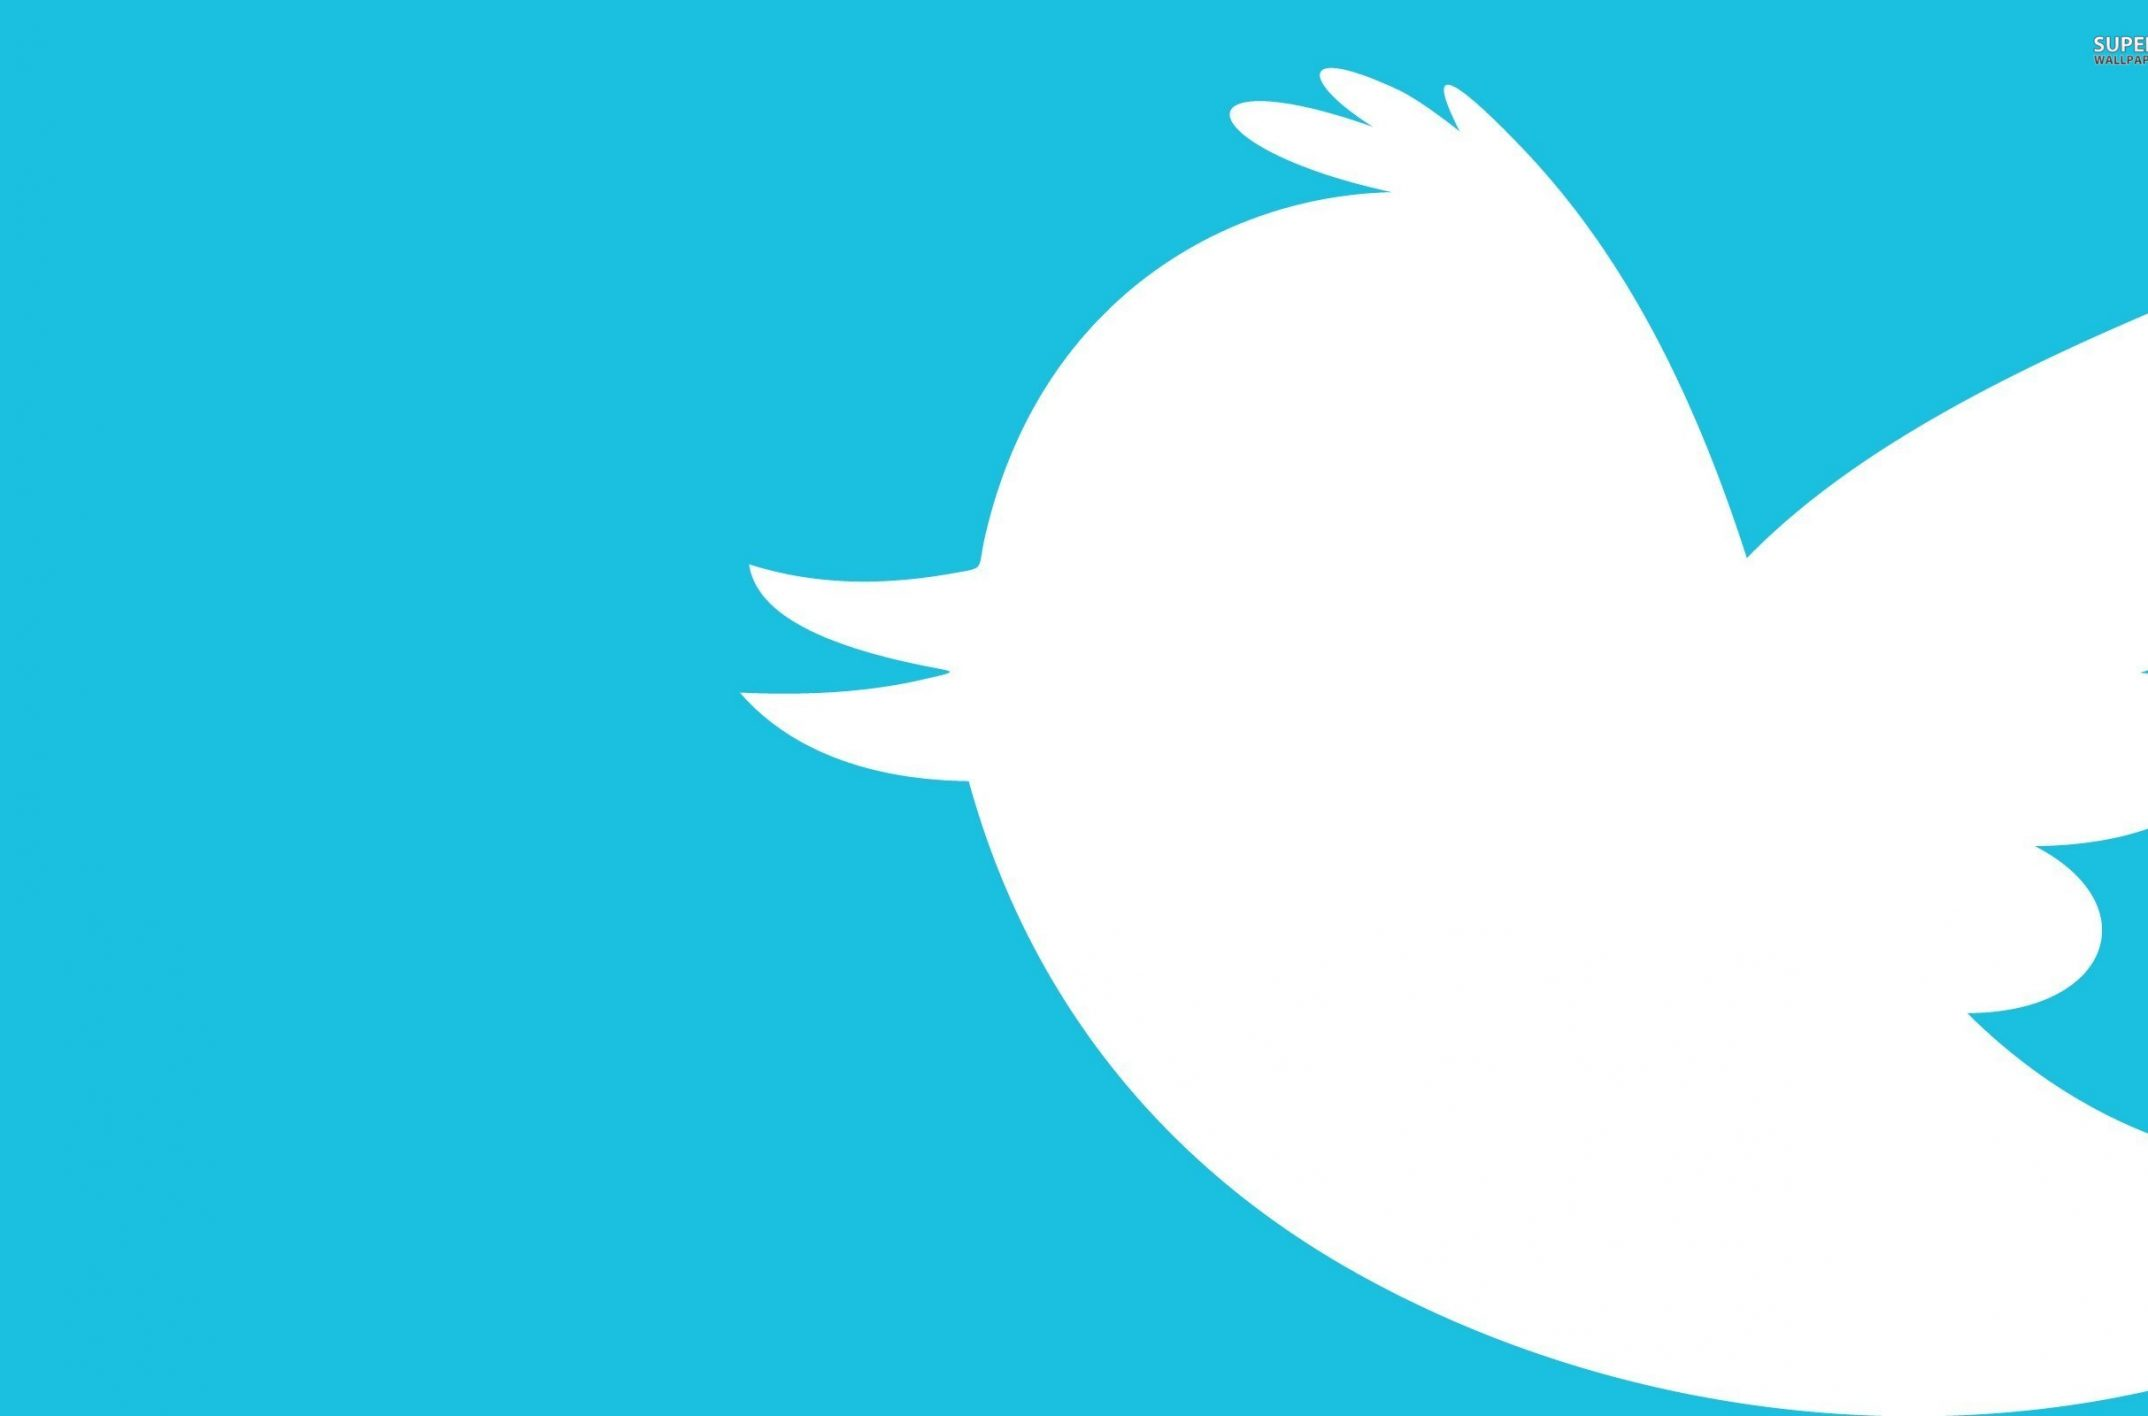 Followers Twitter : comment en gagner facilement et rapidement ?